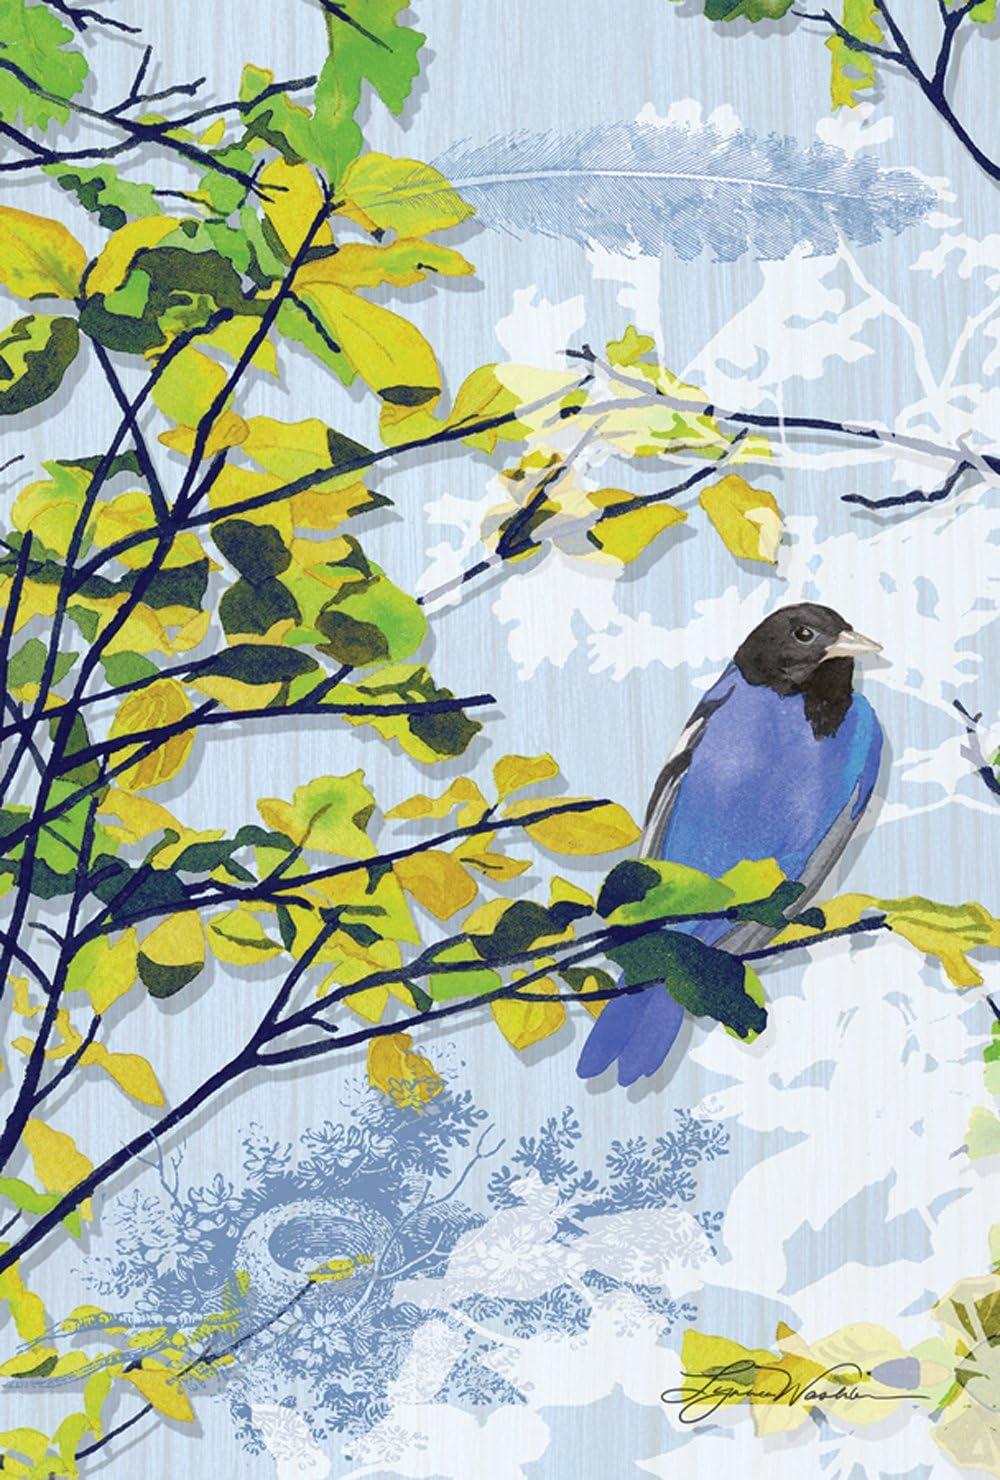 Toland Home Garden 119995 Black and Blue Bird 12.5 x 18 Inch Decorative, Garden Flag-12.5